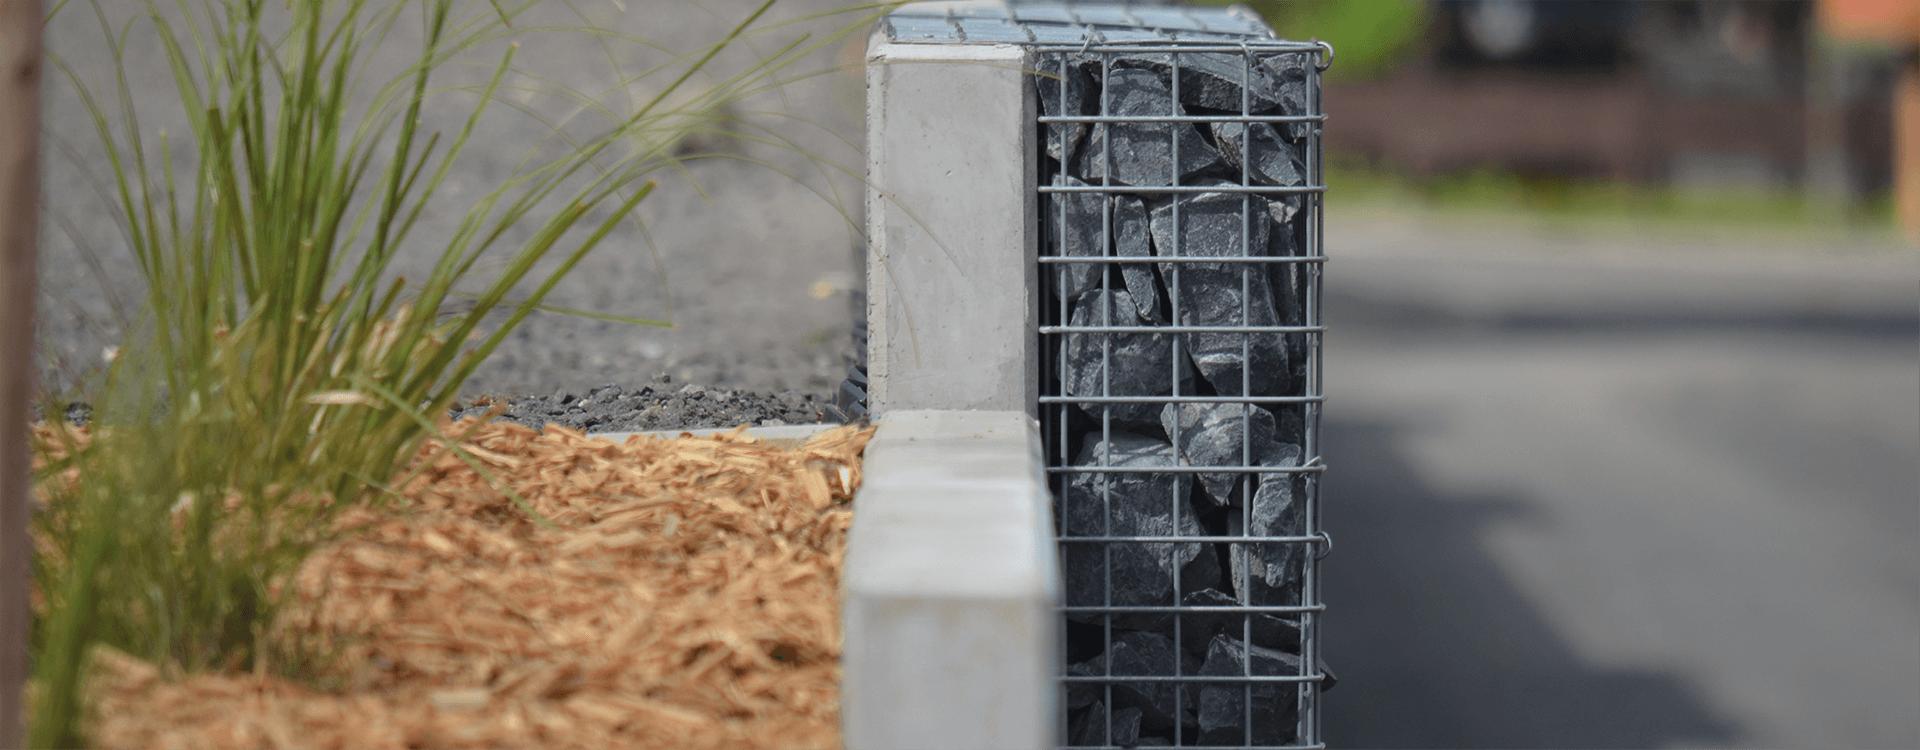 vb beton betonnen keerwanden en prefab elementen. Black Bedroom Furniture Sets. Home Design Ideas